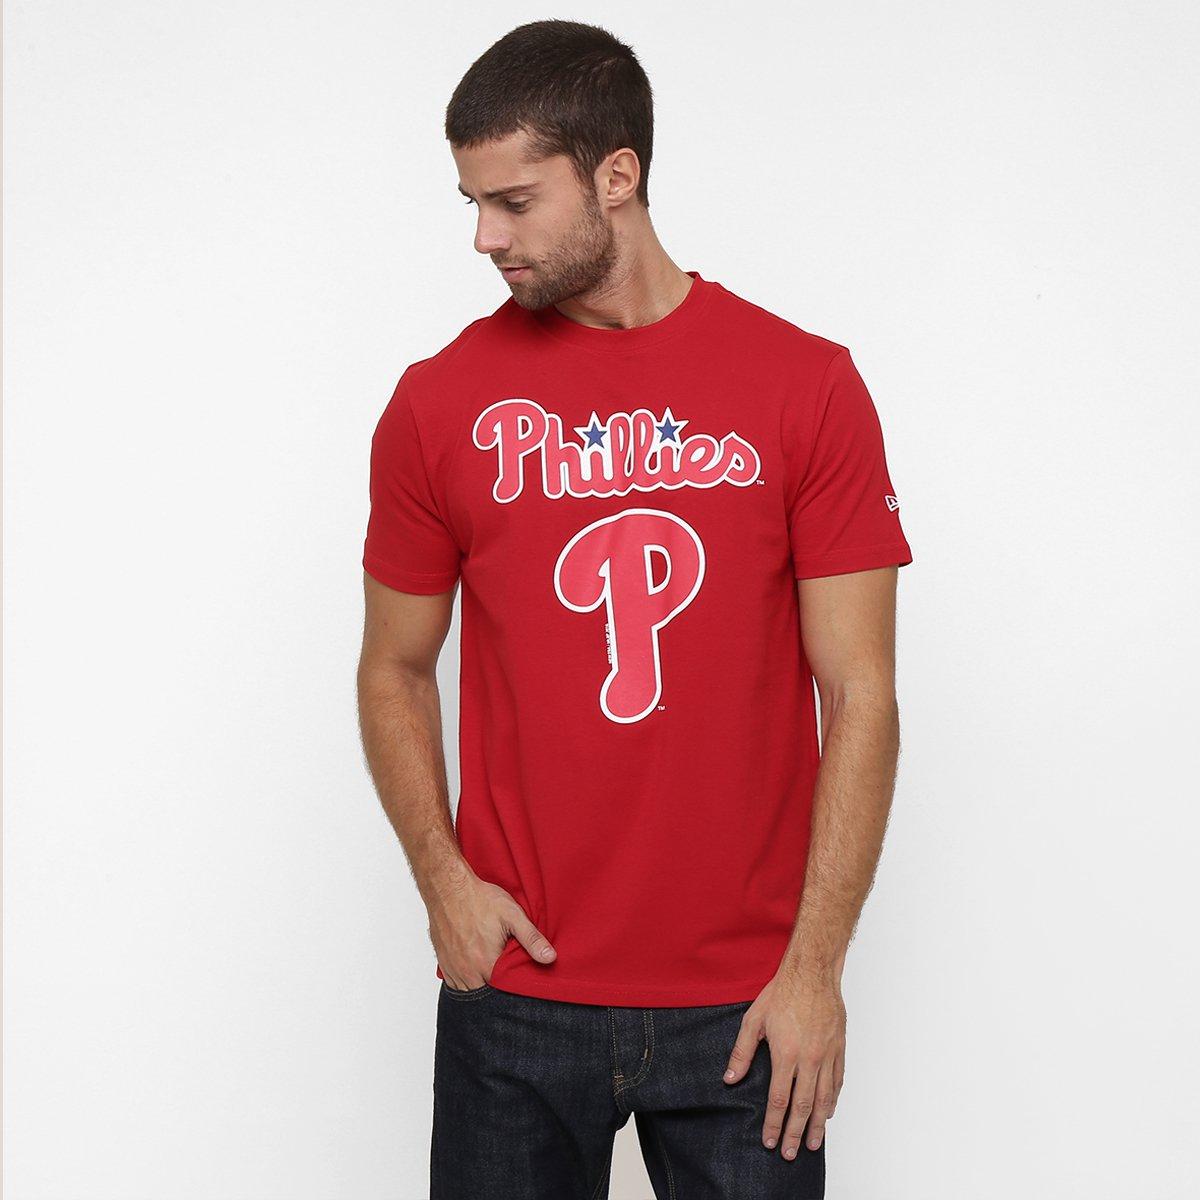 Camiseta New Era MLB Basic Philadelphia Phillies - Compre Agora ... b6a24799171